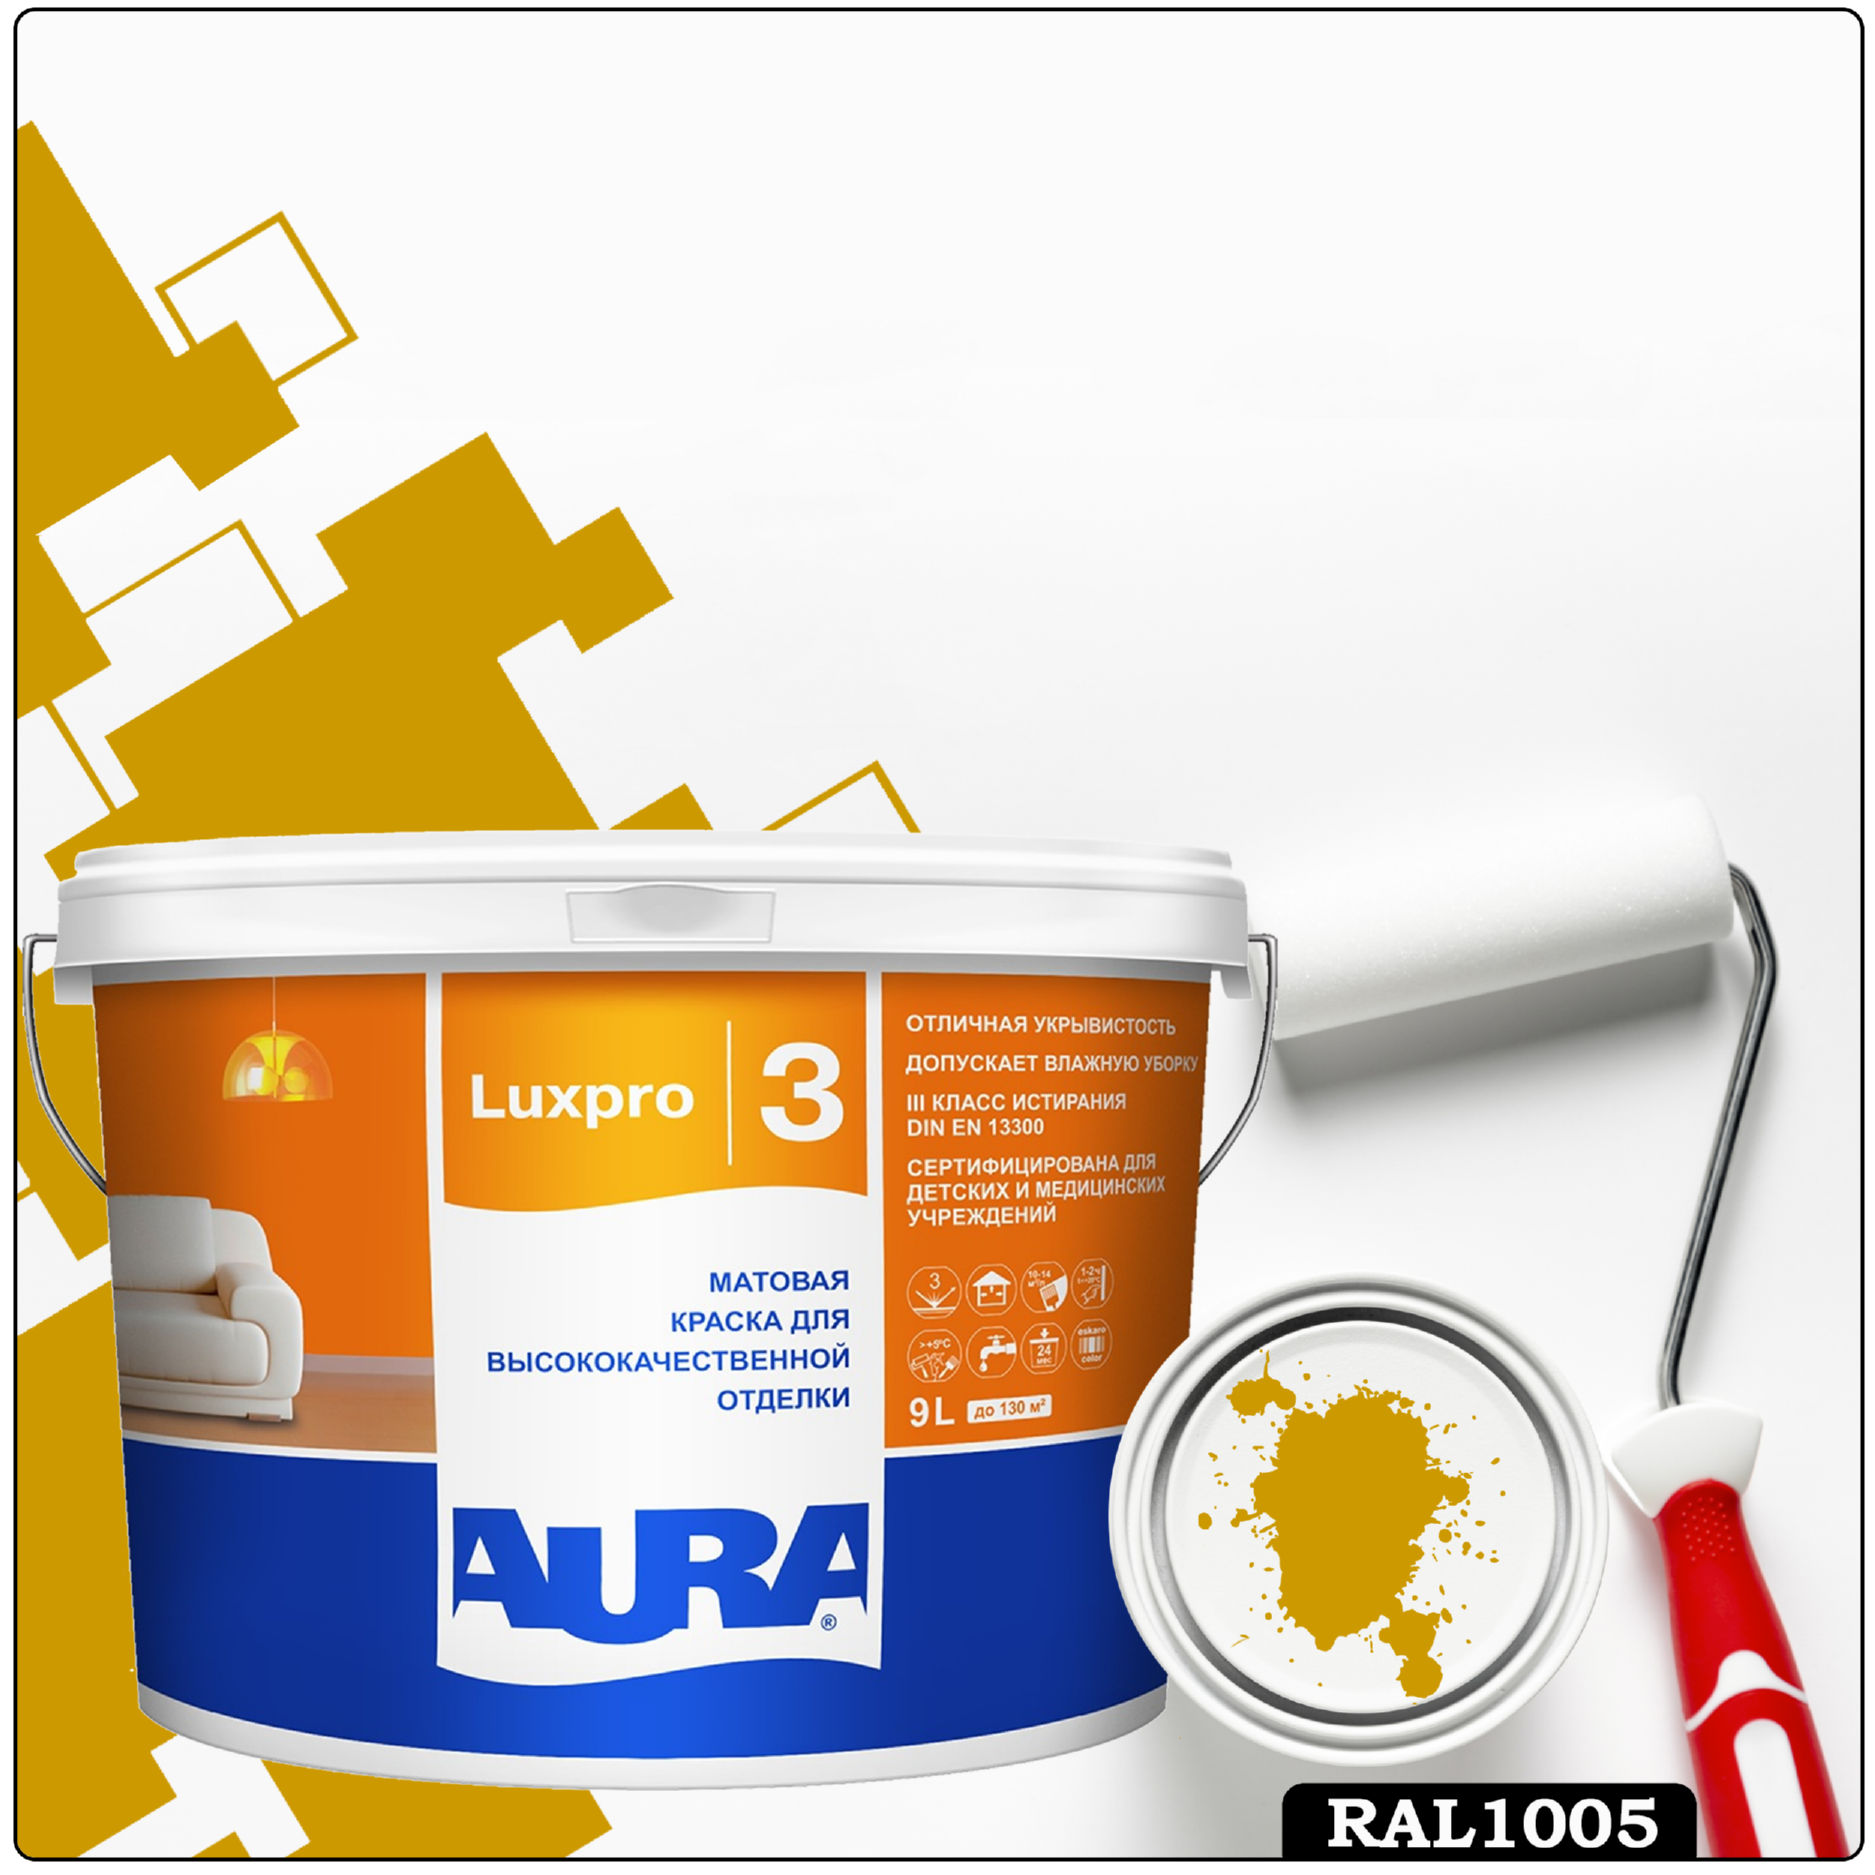 Фото 6 - Краска Aura LuxPRO 3, RAL 1005 Медово-жёлтый, латексная, шелково-матовая, интерьерная, 9л, Аура.